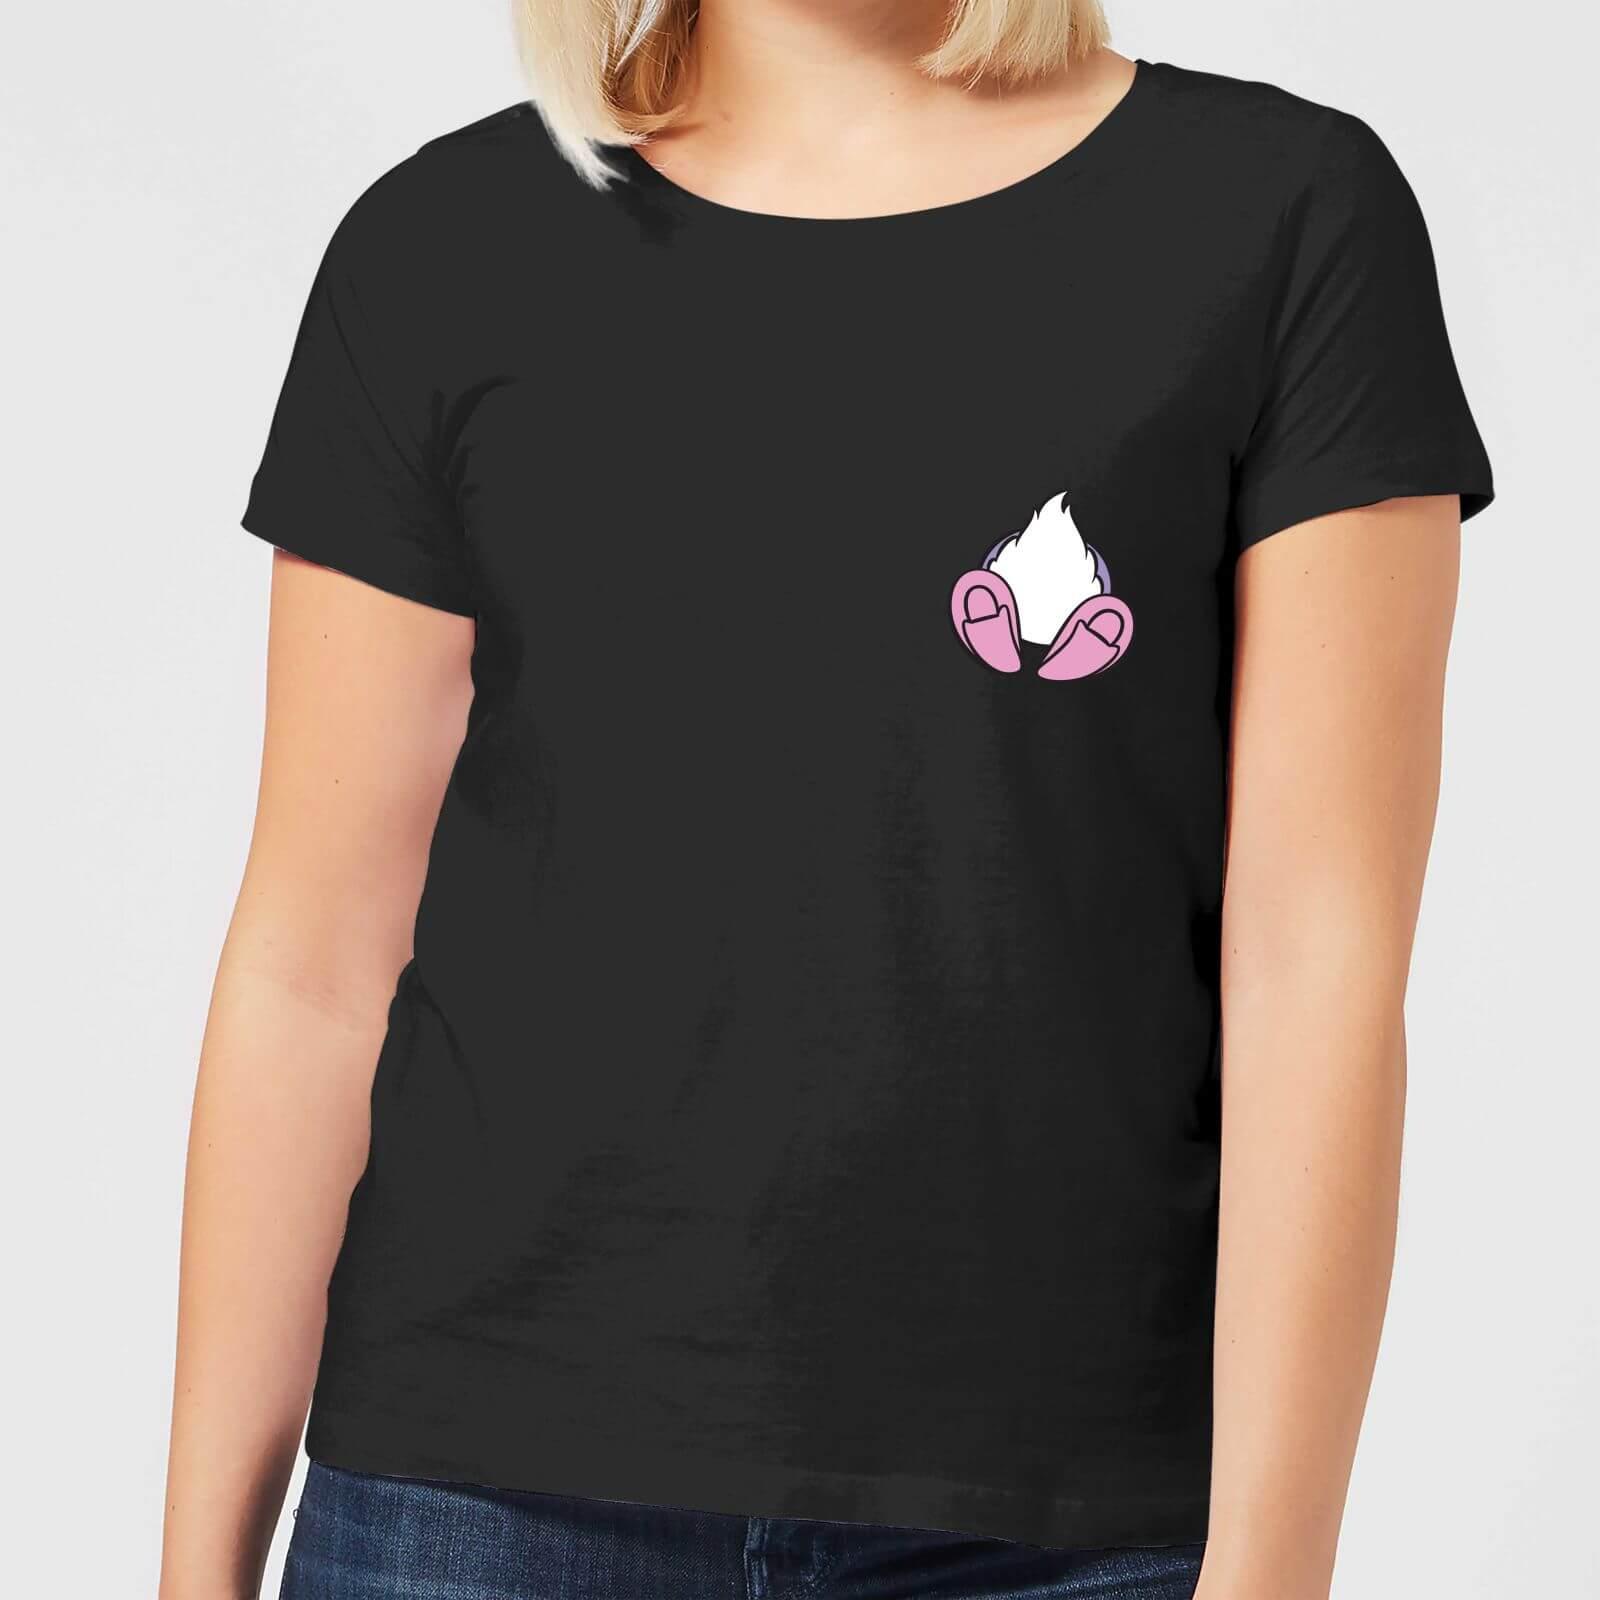 Disney Disney Daisy Duck Backside Women's T-Shirt - Black - 3XL - Black